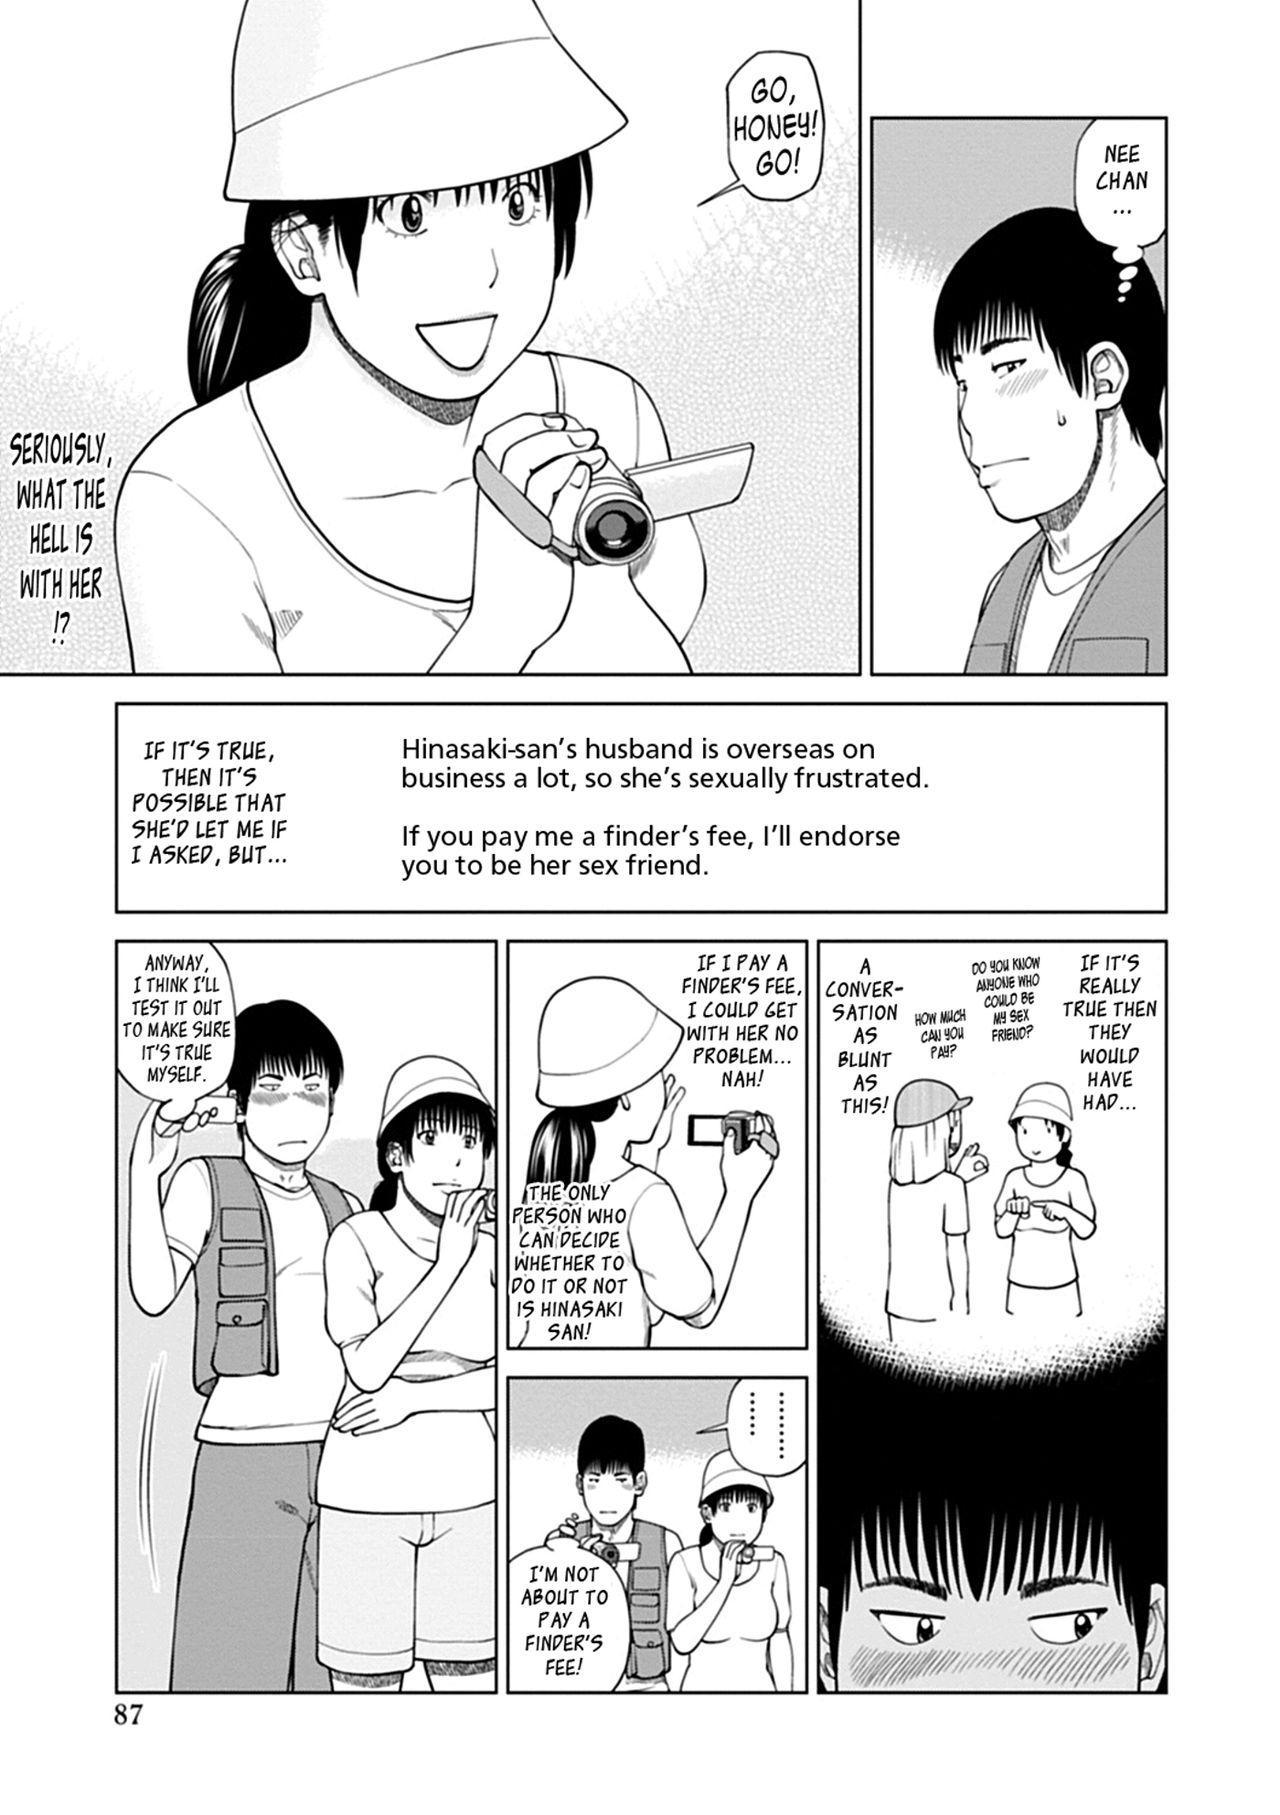 [Kuroki Hidehiko] 36-sai Injuku Sakarizuma | 36-Year-Old Randy Mature Wife [English] {Tadanohito} [Digital] [Uncensored] 83